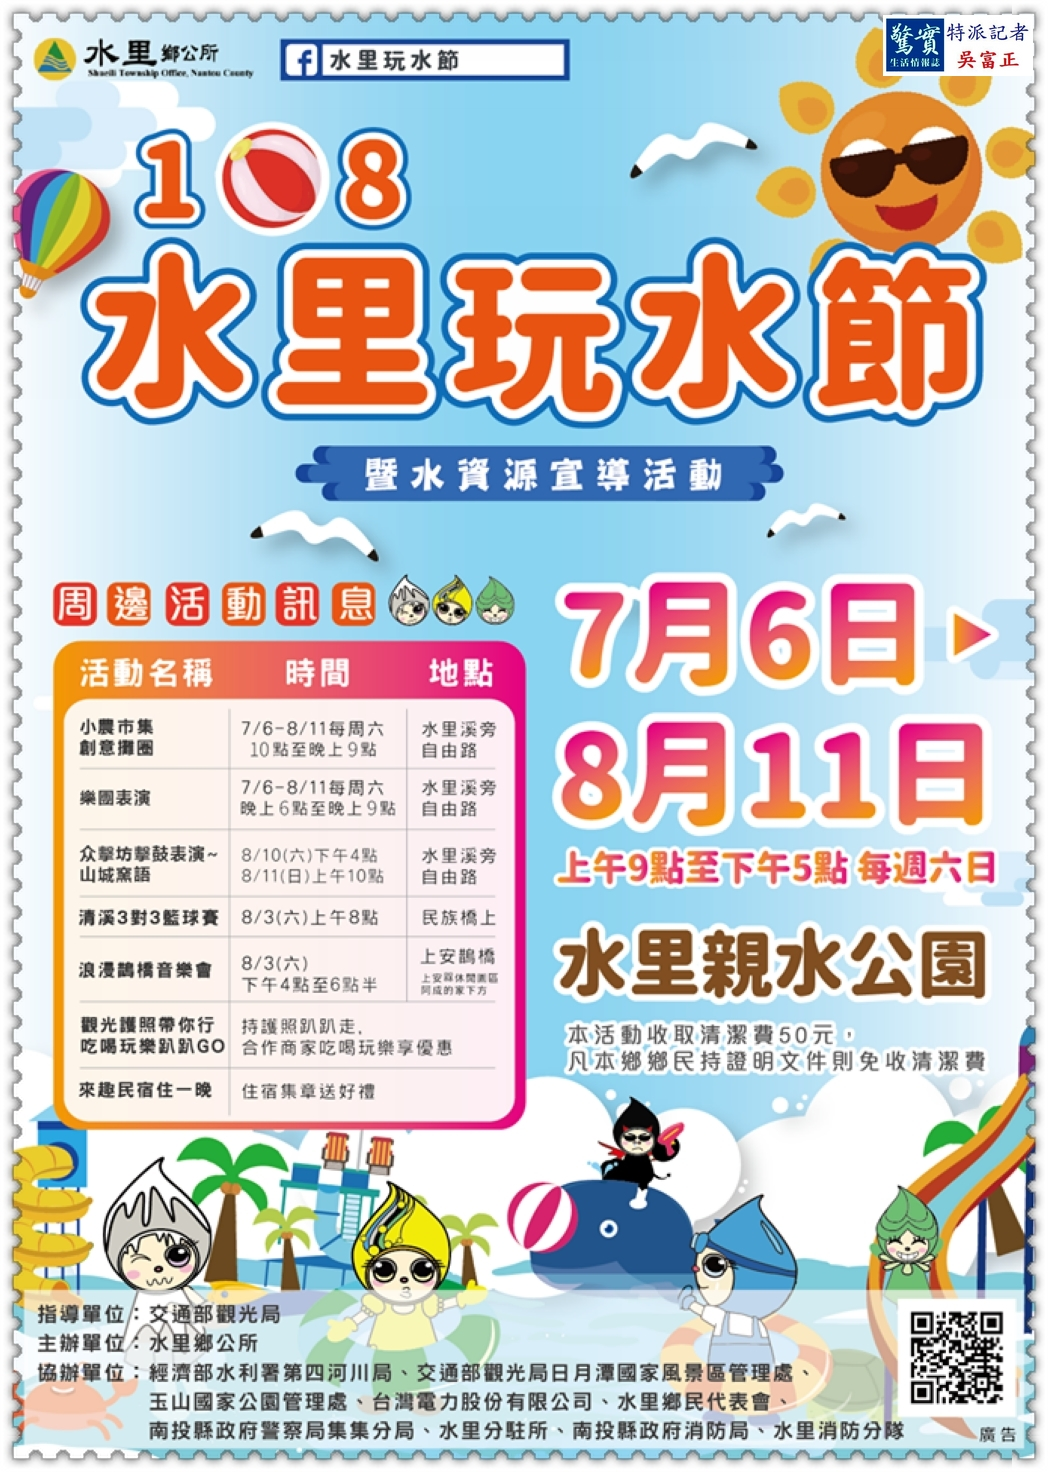 20190626a(驚實報)-【漫遊台灣.南投】日月潭2日遊/108年水里玩水節02